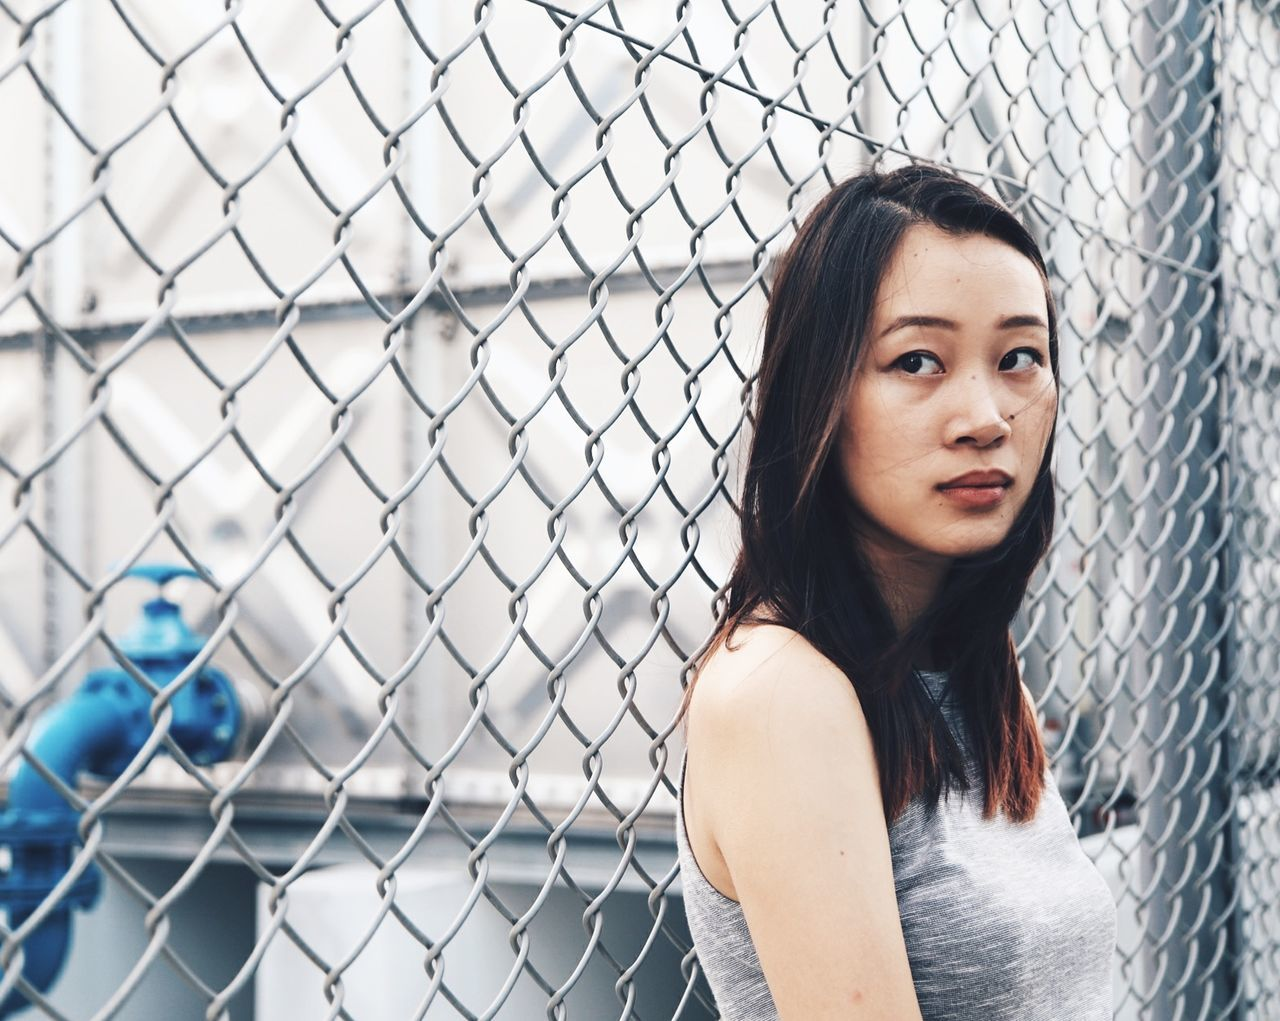 killer gaze Portrait Portrait Of A Woman Portrait Of A Friend Girl Woman Eye4photography  EyeEm Best Shots EyeEm Best Edits Portrait Of A Girl Colors Desaturated Neutral Singapore Gaze Faces Of EyeEm Urban Urban Portrait Urbex